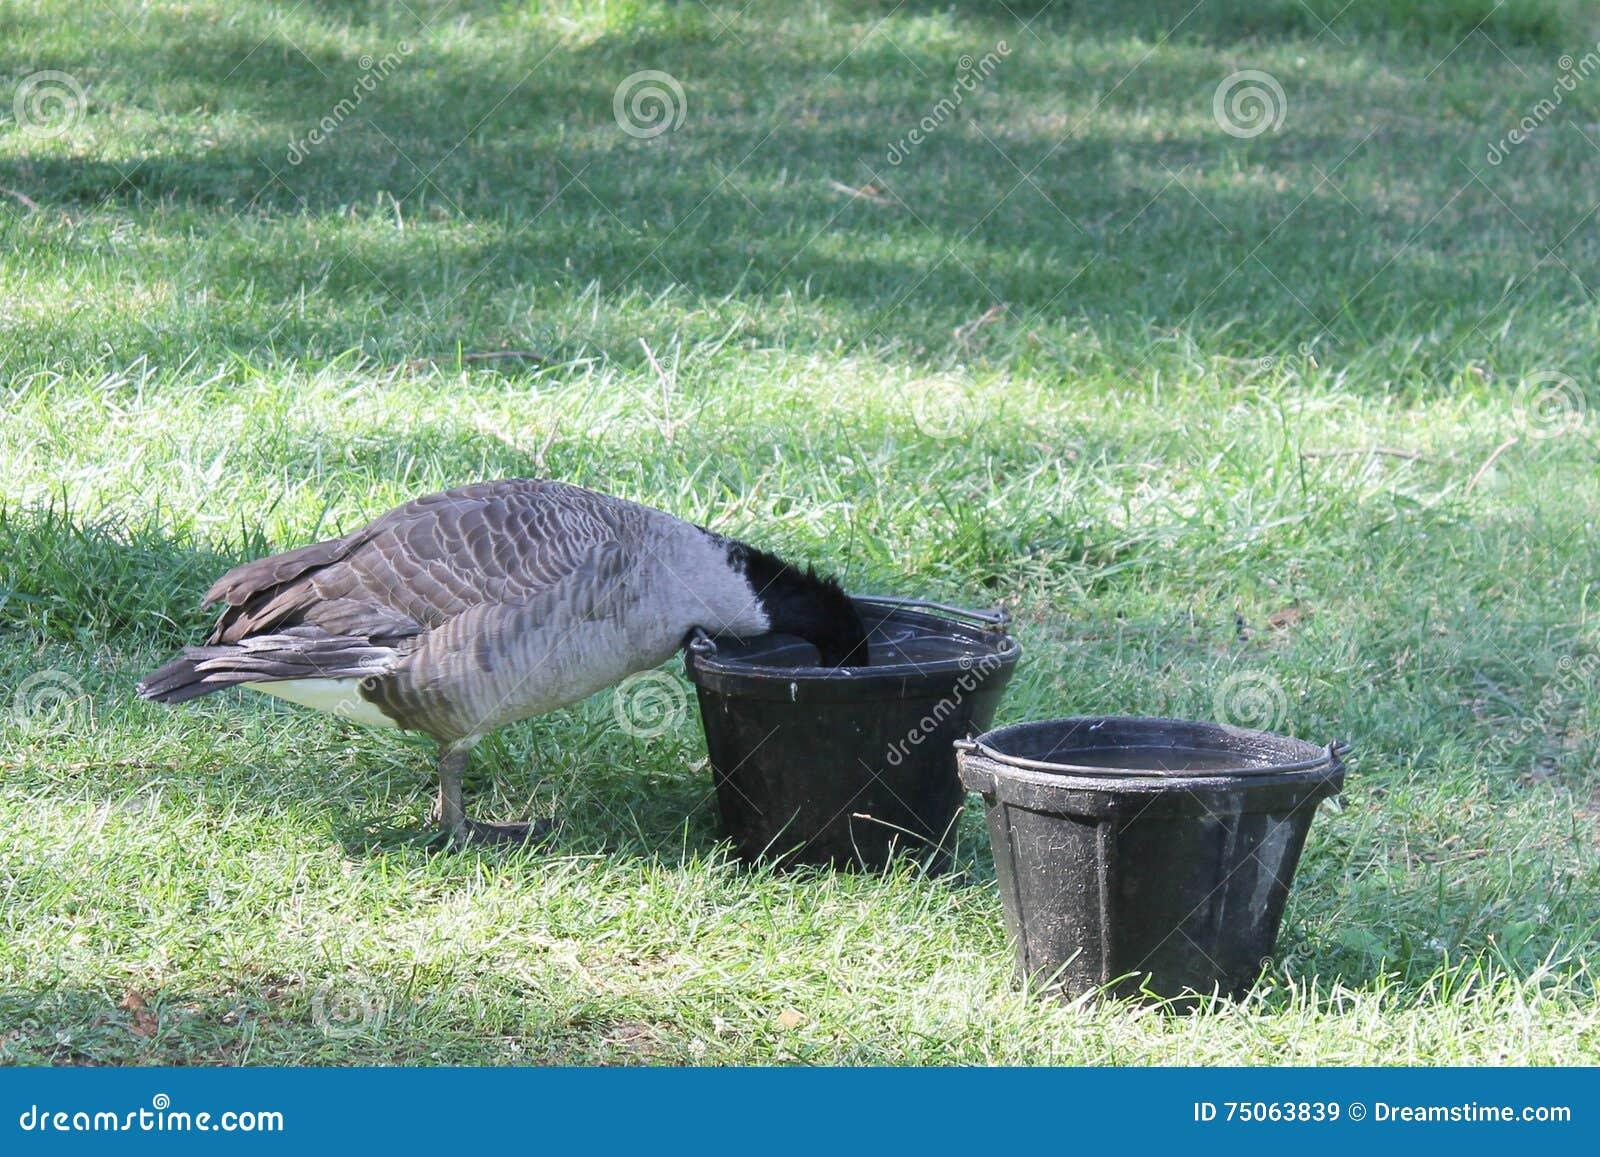 Goose in water bowl